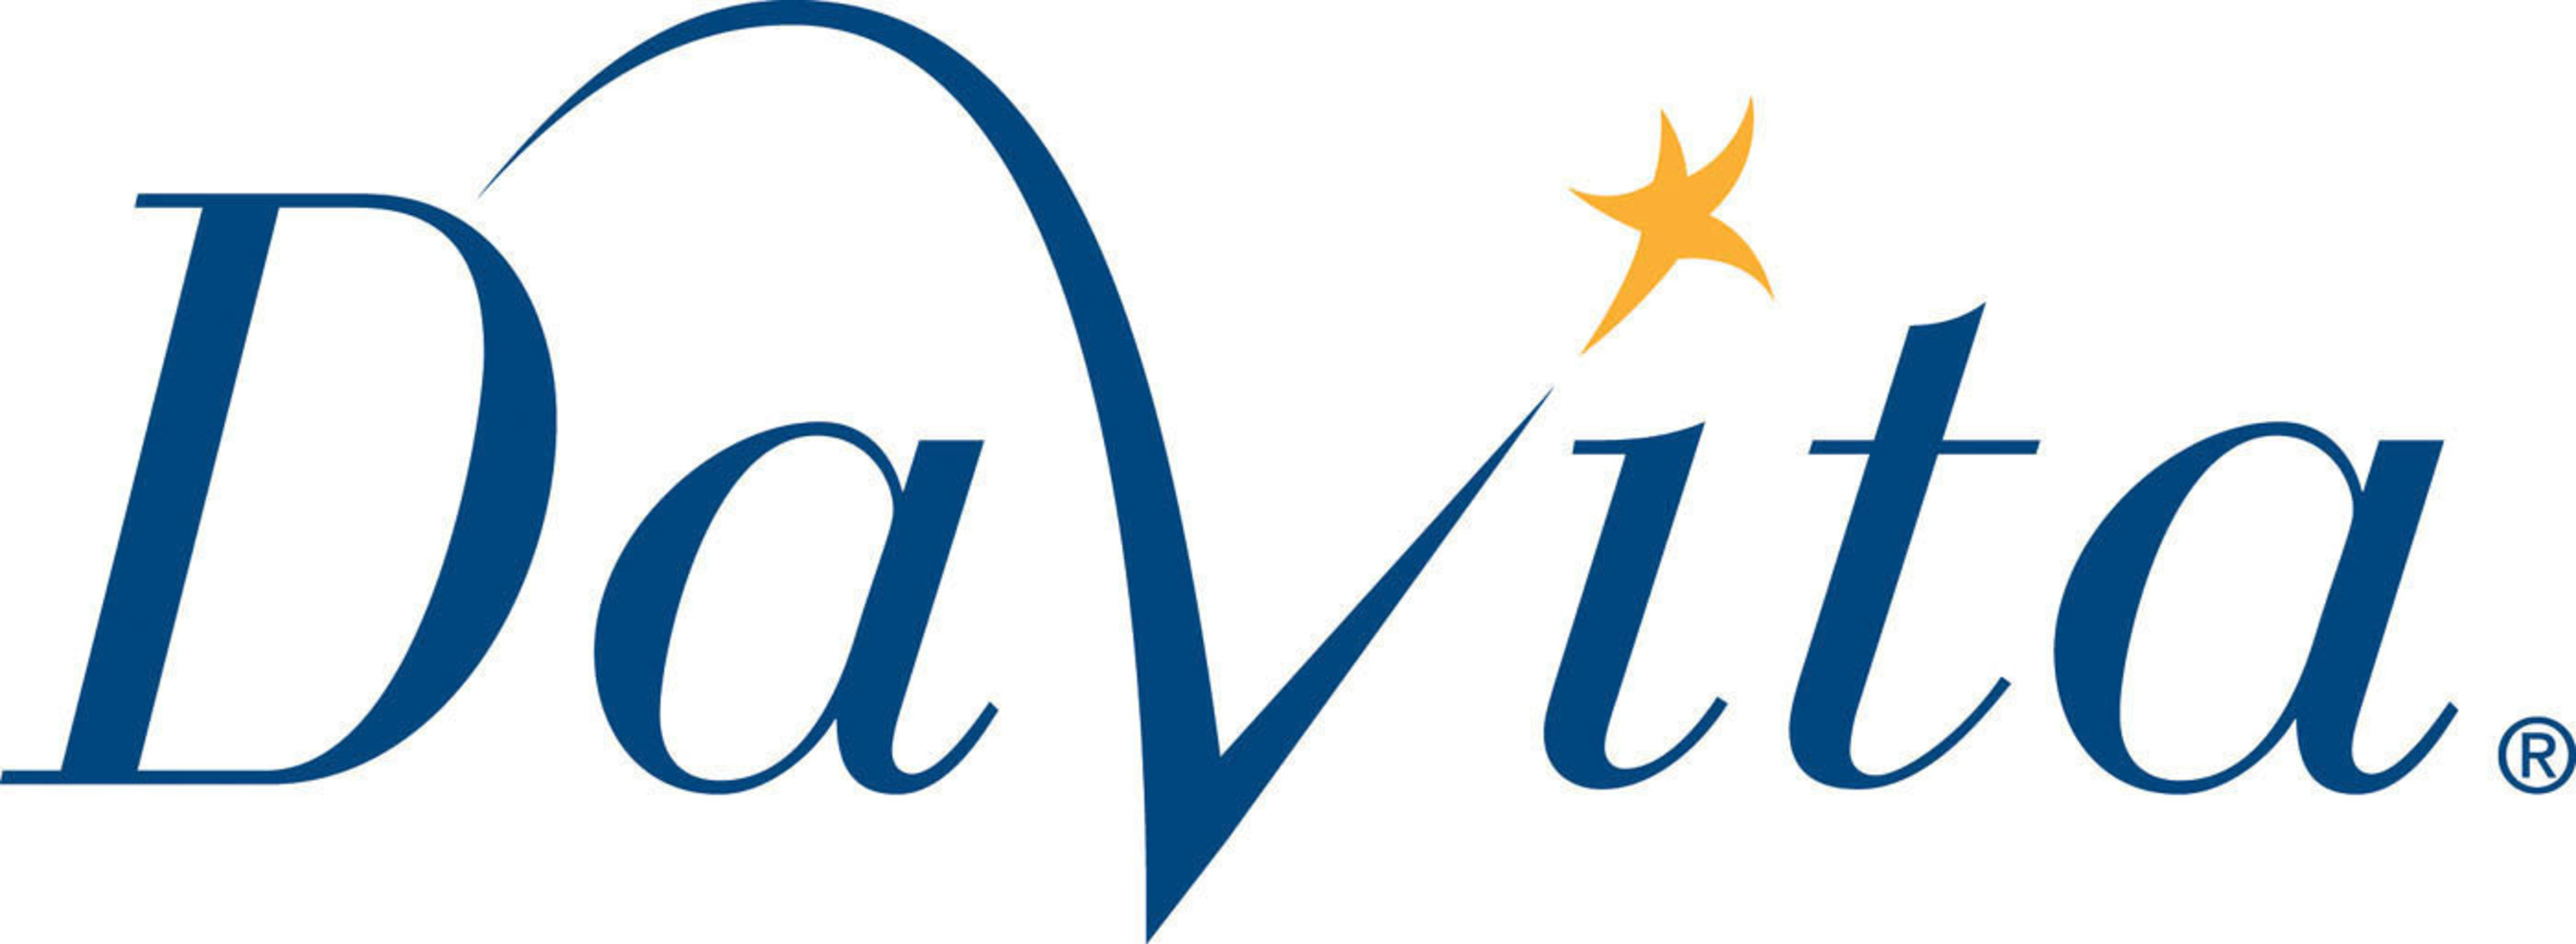 DaVita Announces Change for Medicaid Patients Seeking